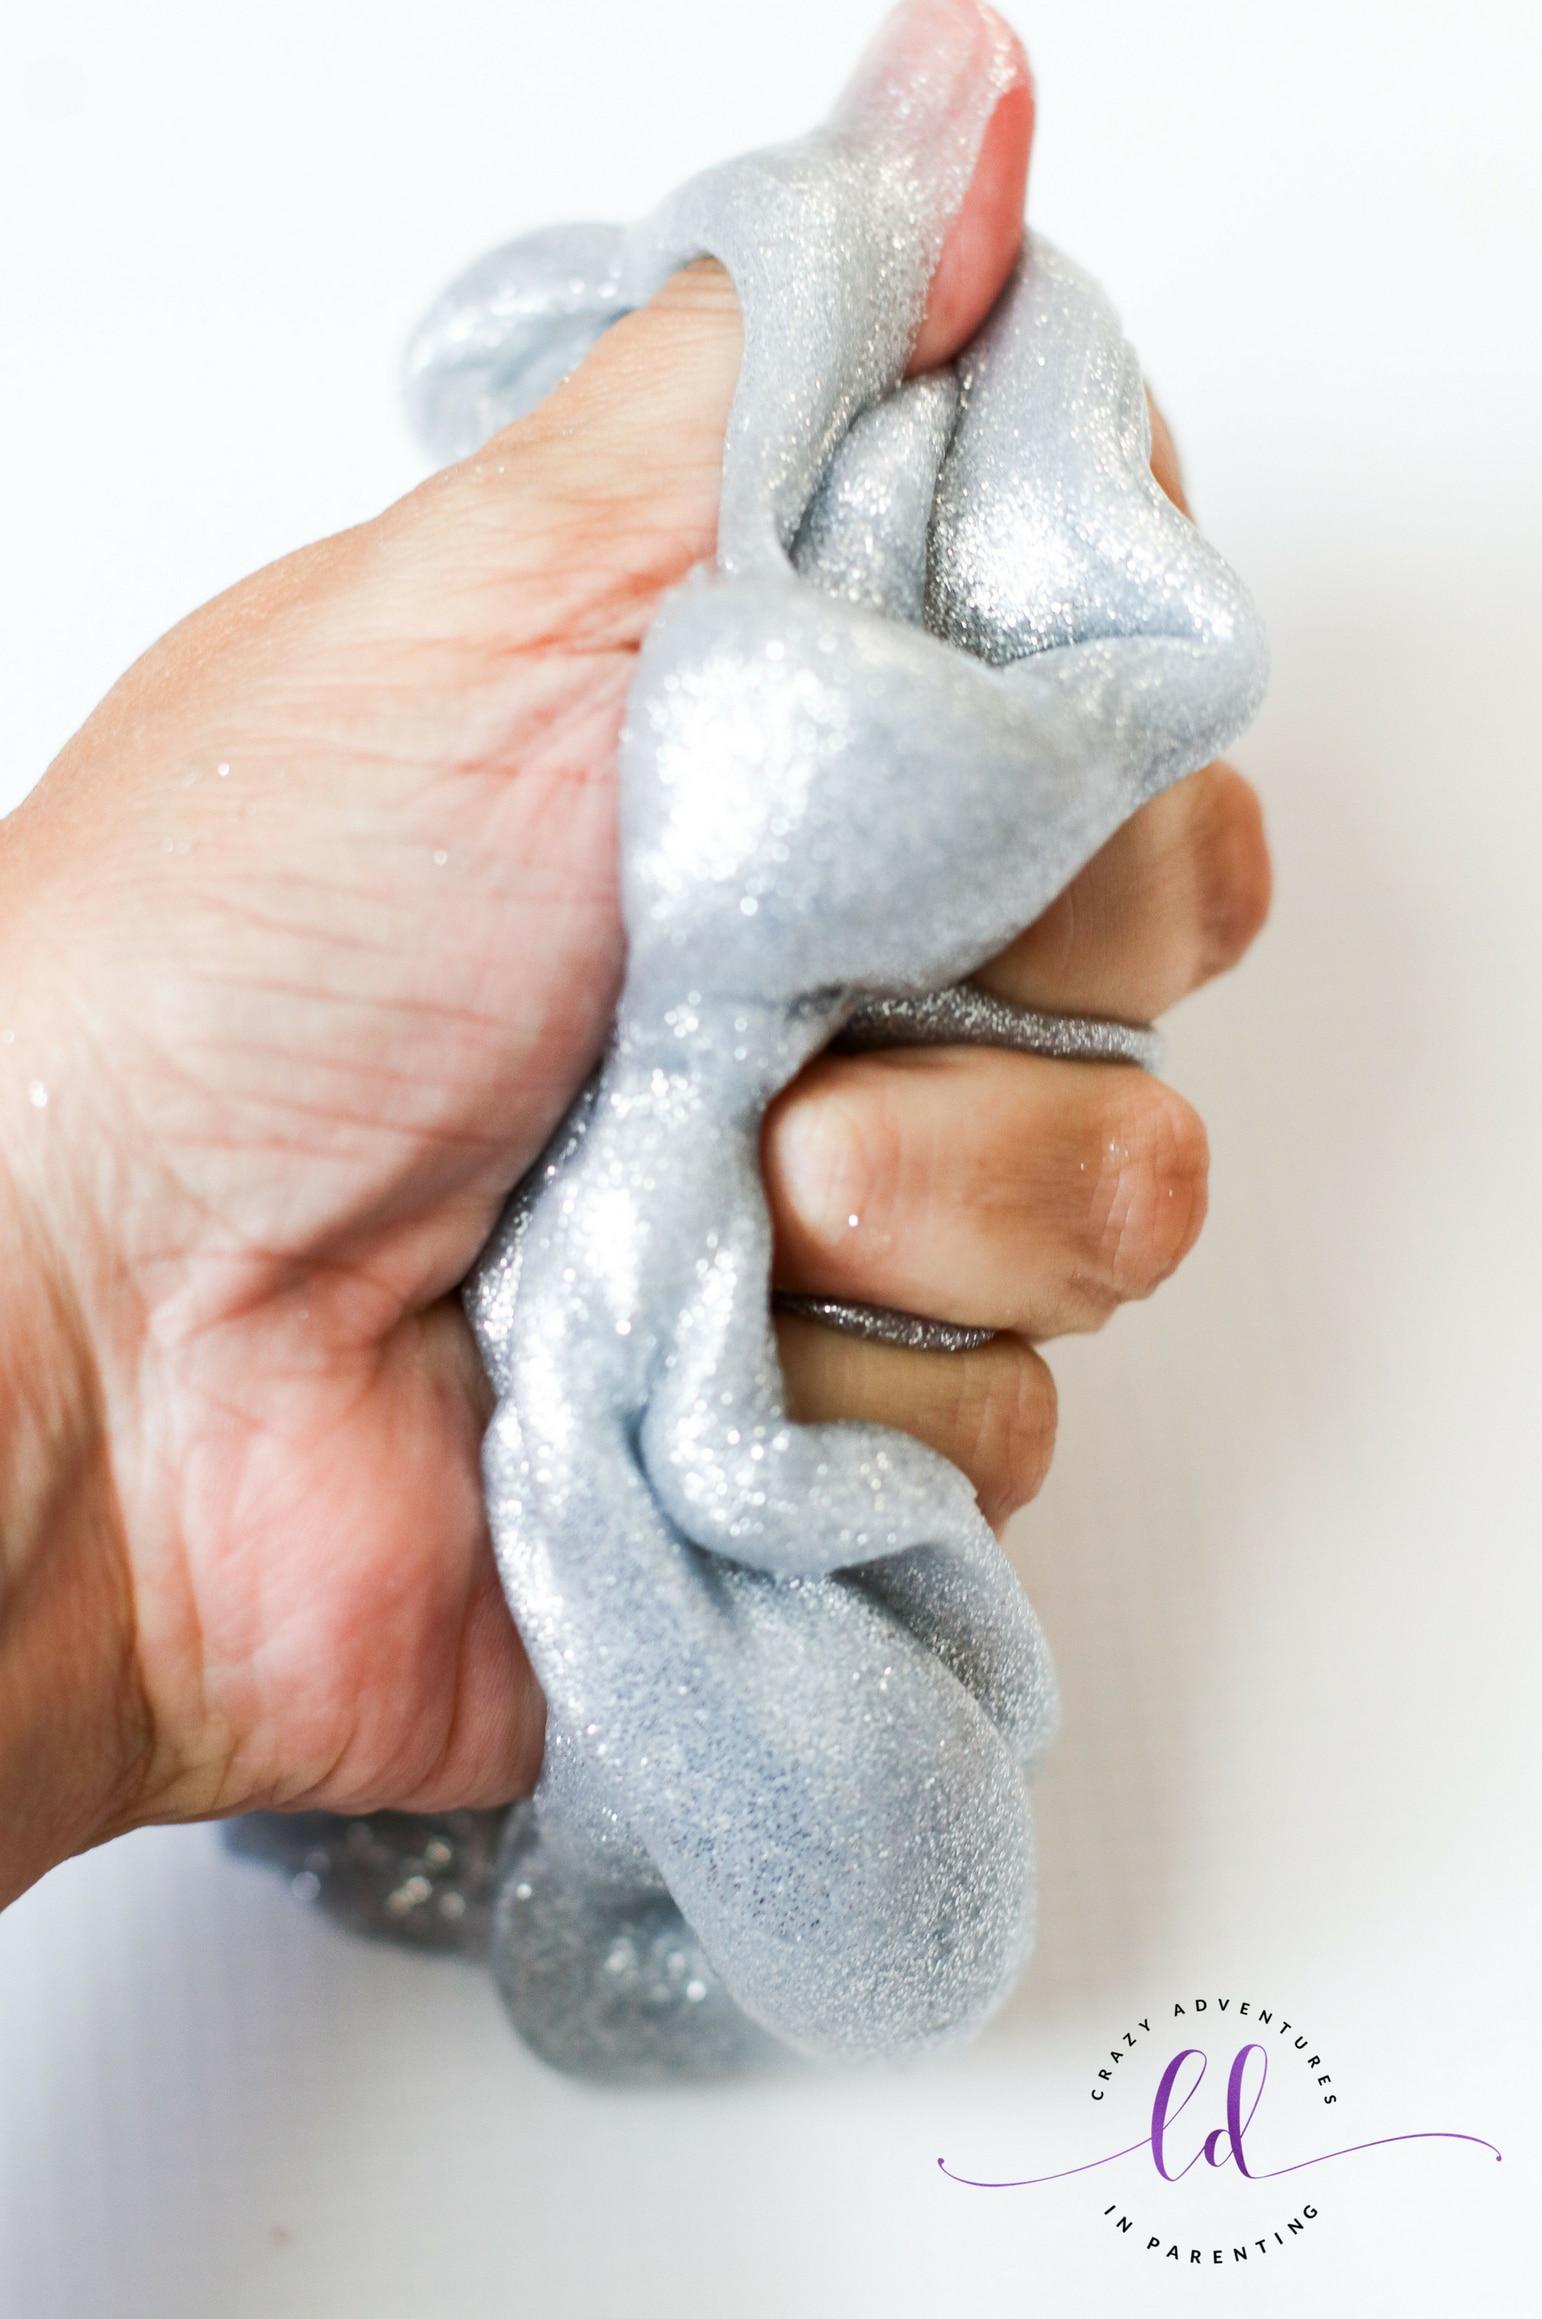 Squish silver glitter slime